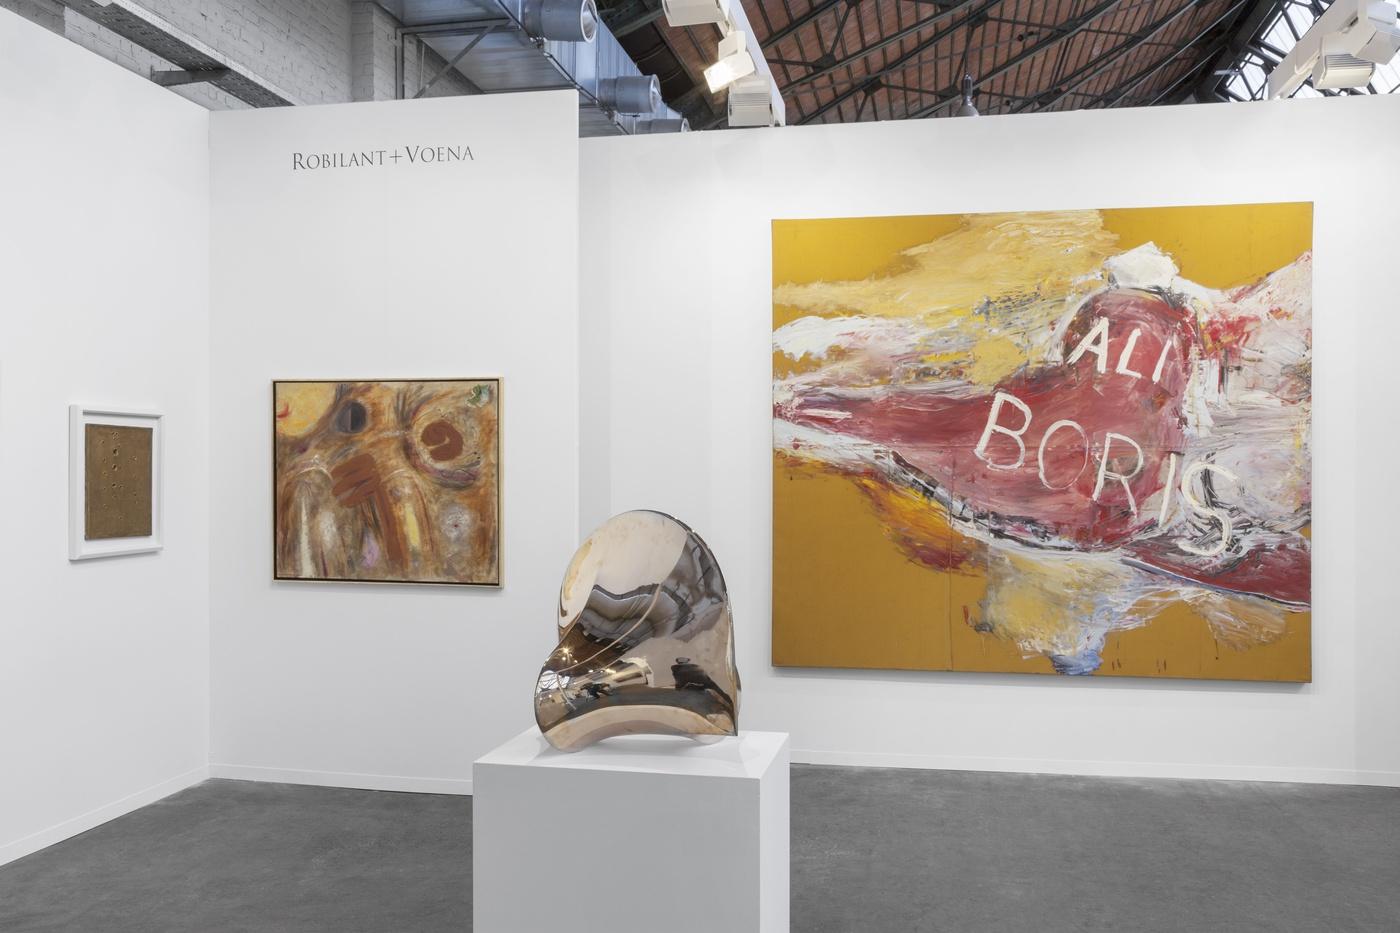 Art Brussels 2017 - lo stand di Axel Vervoordt